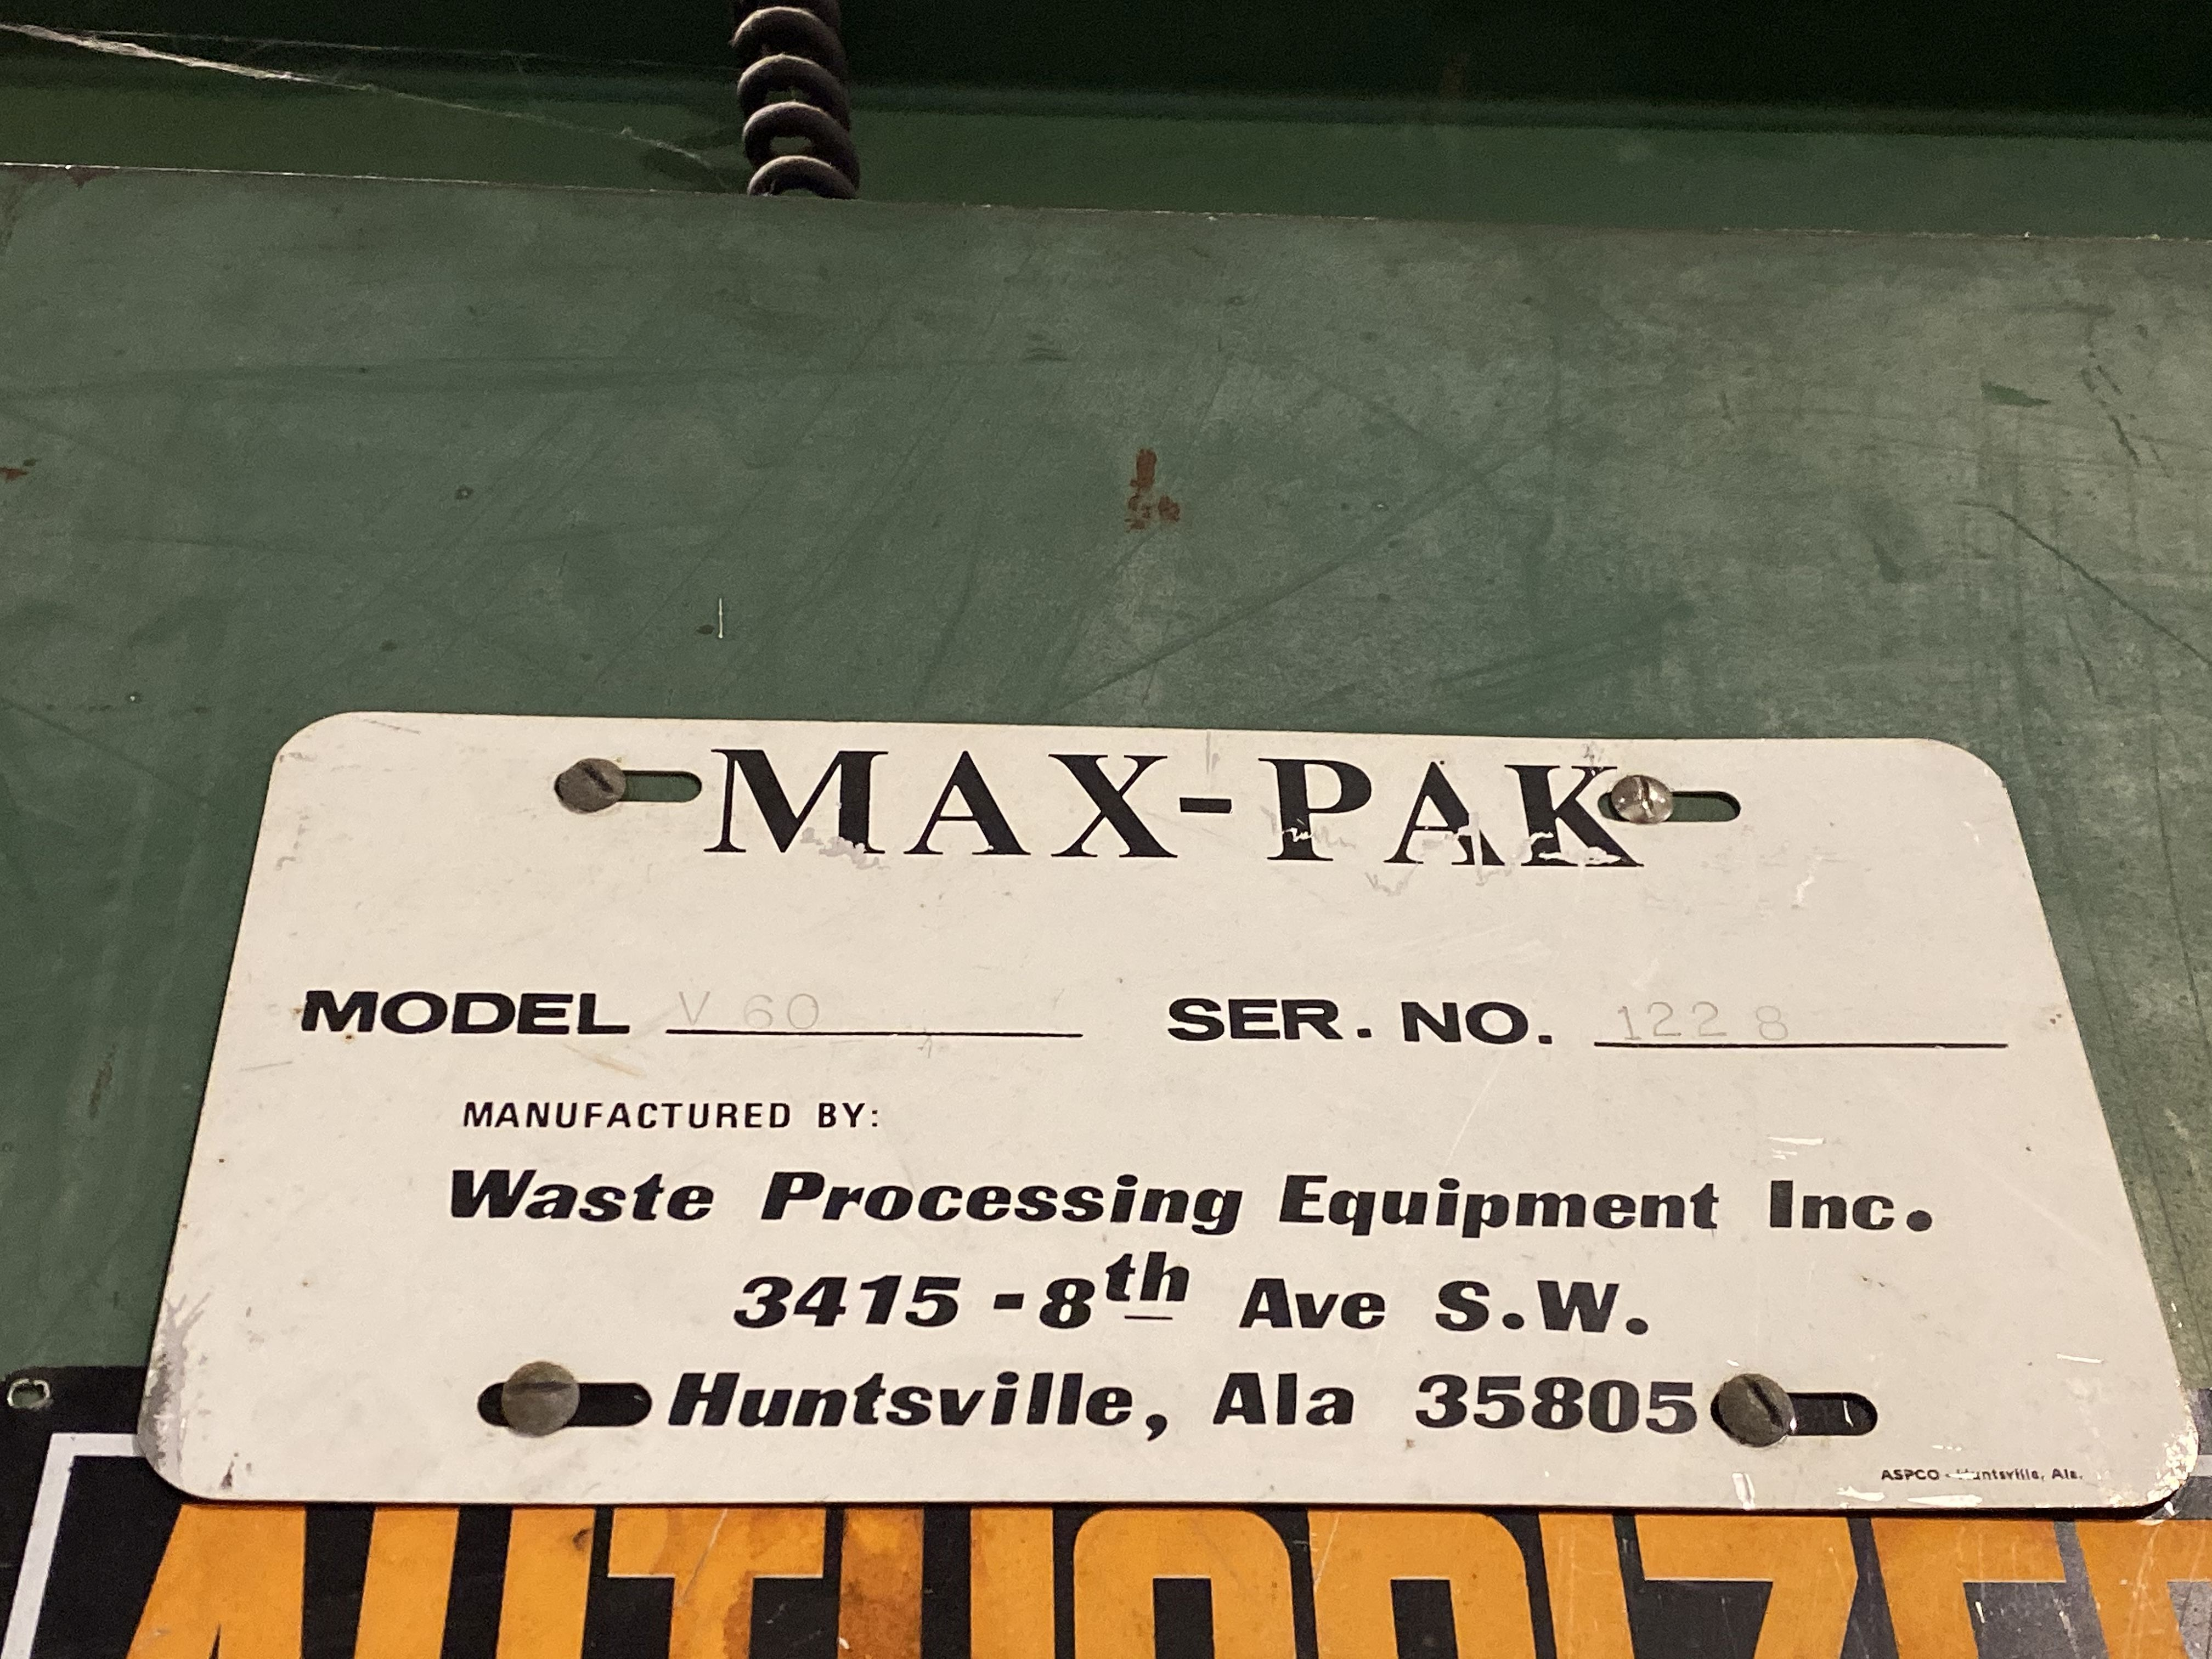 MAX-PAK MODEL V60 HYDRAULIC BALER; S/N 1228 - Image 4 of 4